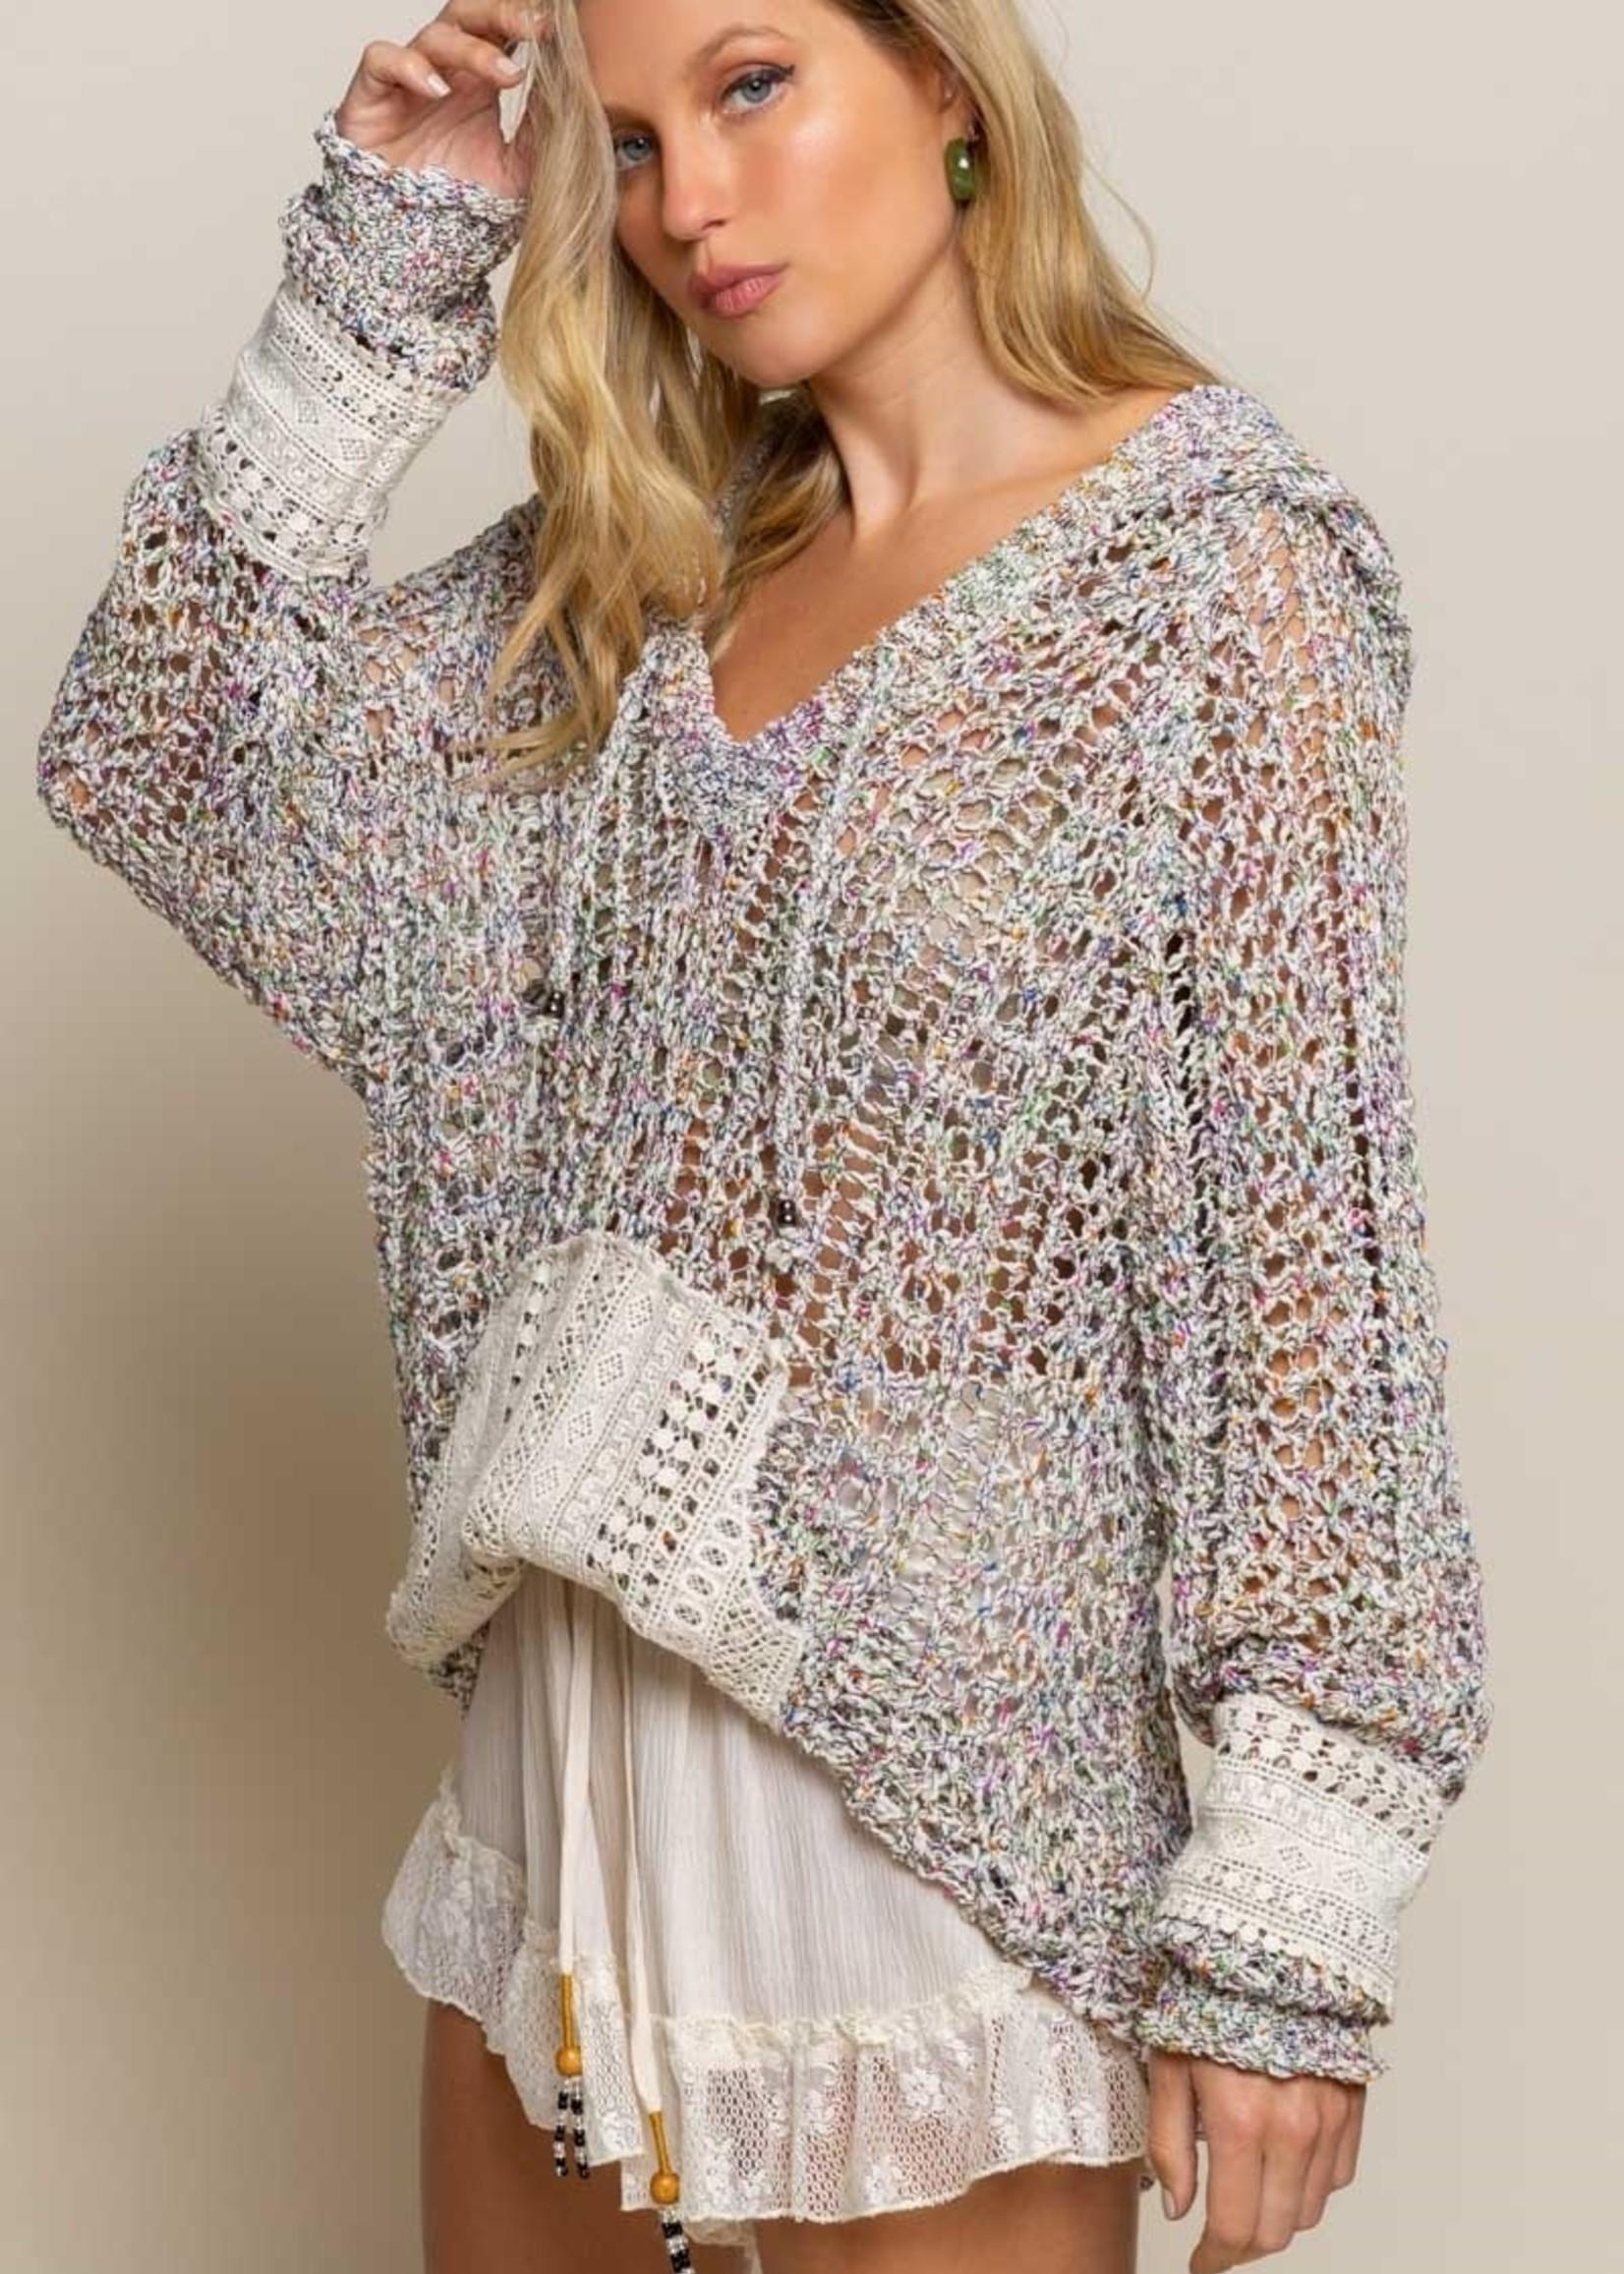 POL POL Fairground Sprinkle Lightweight Sweater